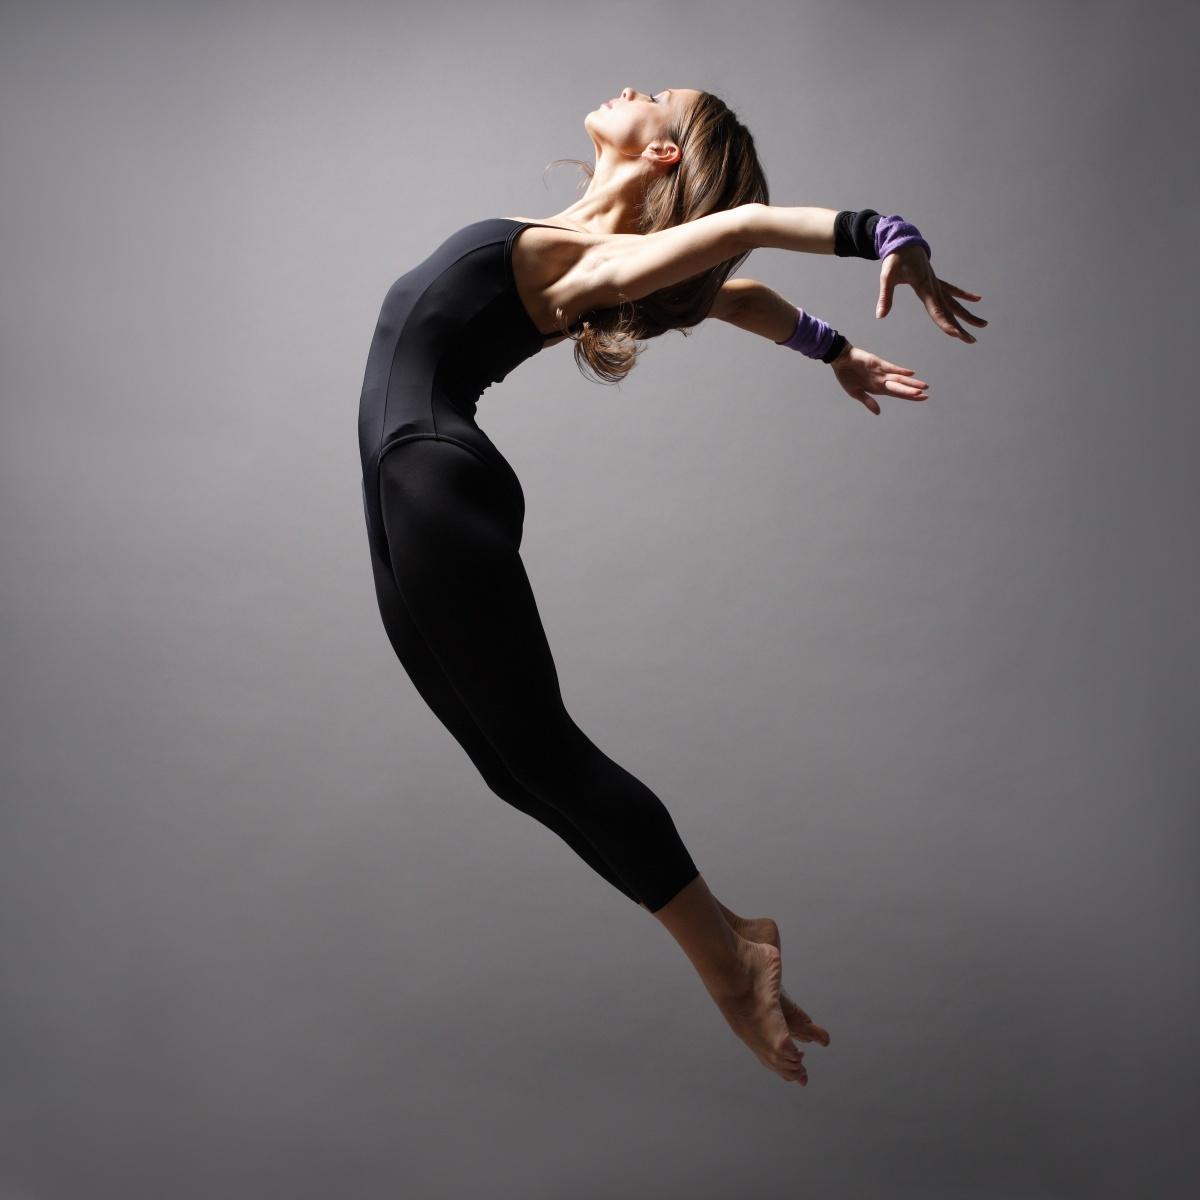 Девушка в прыжке - Girl in jump